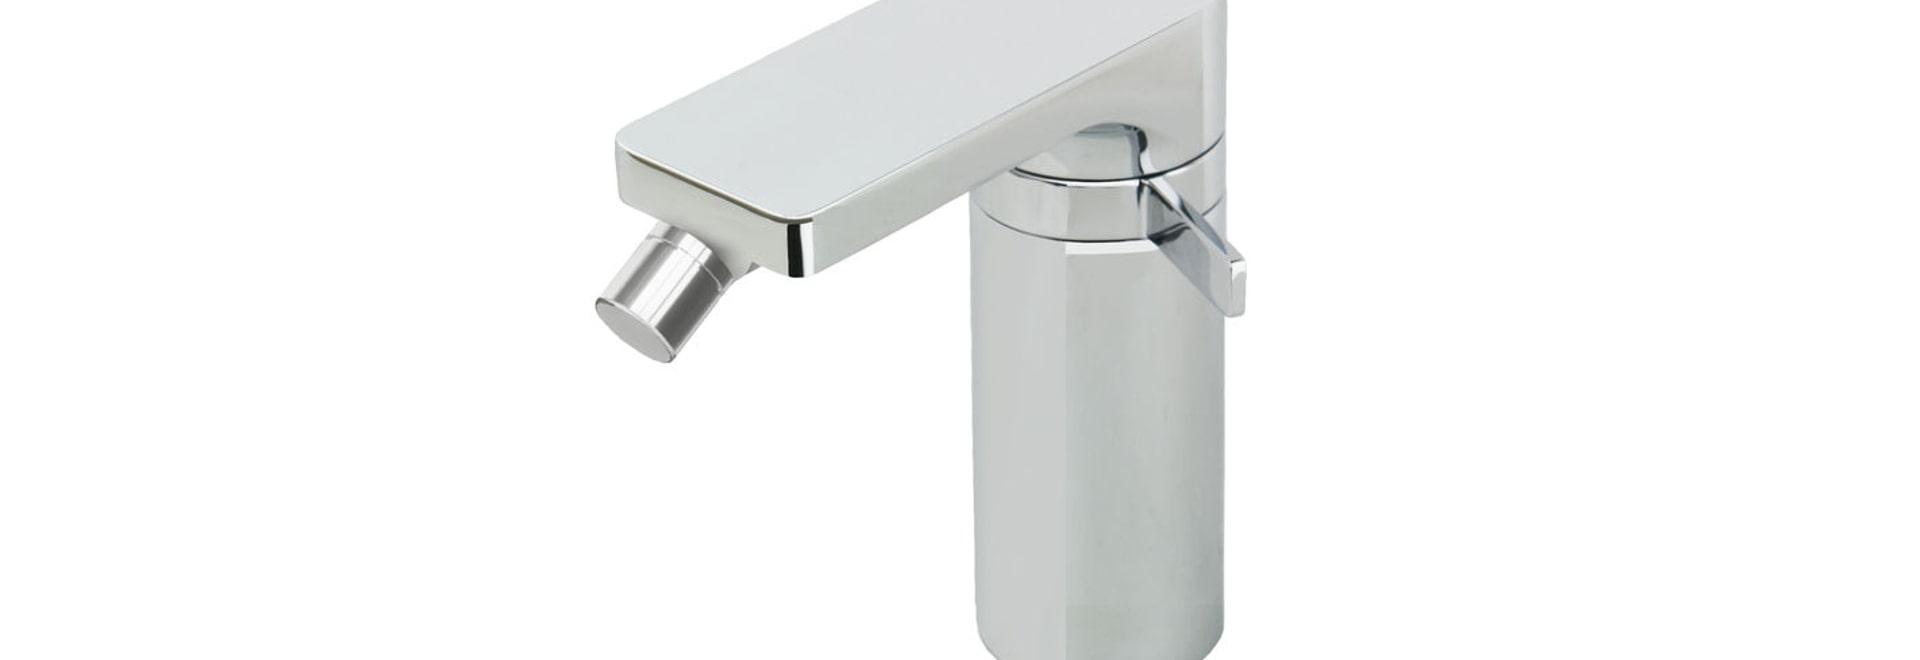 NEW washbasin mixer tap by RAMON SOLER   RAMON SOLER